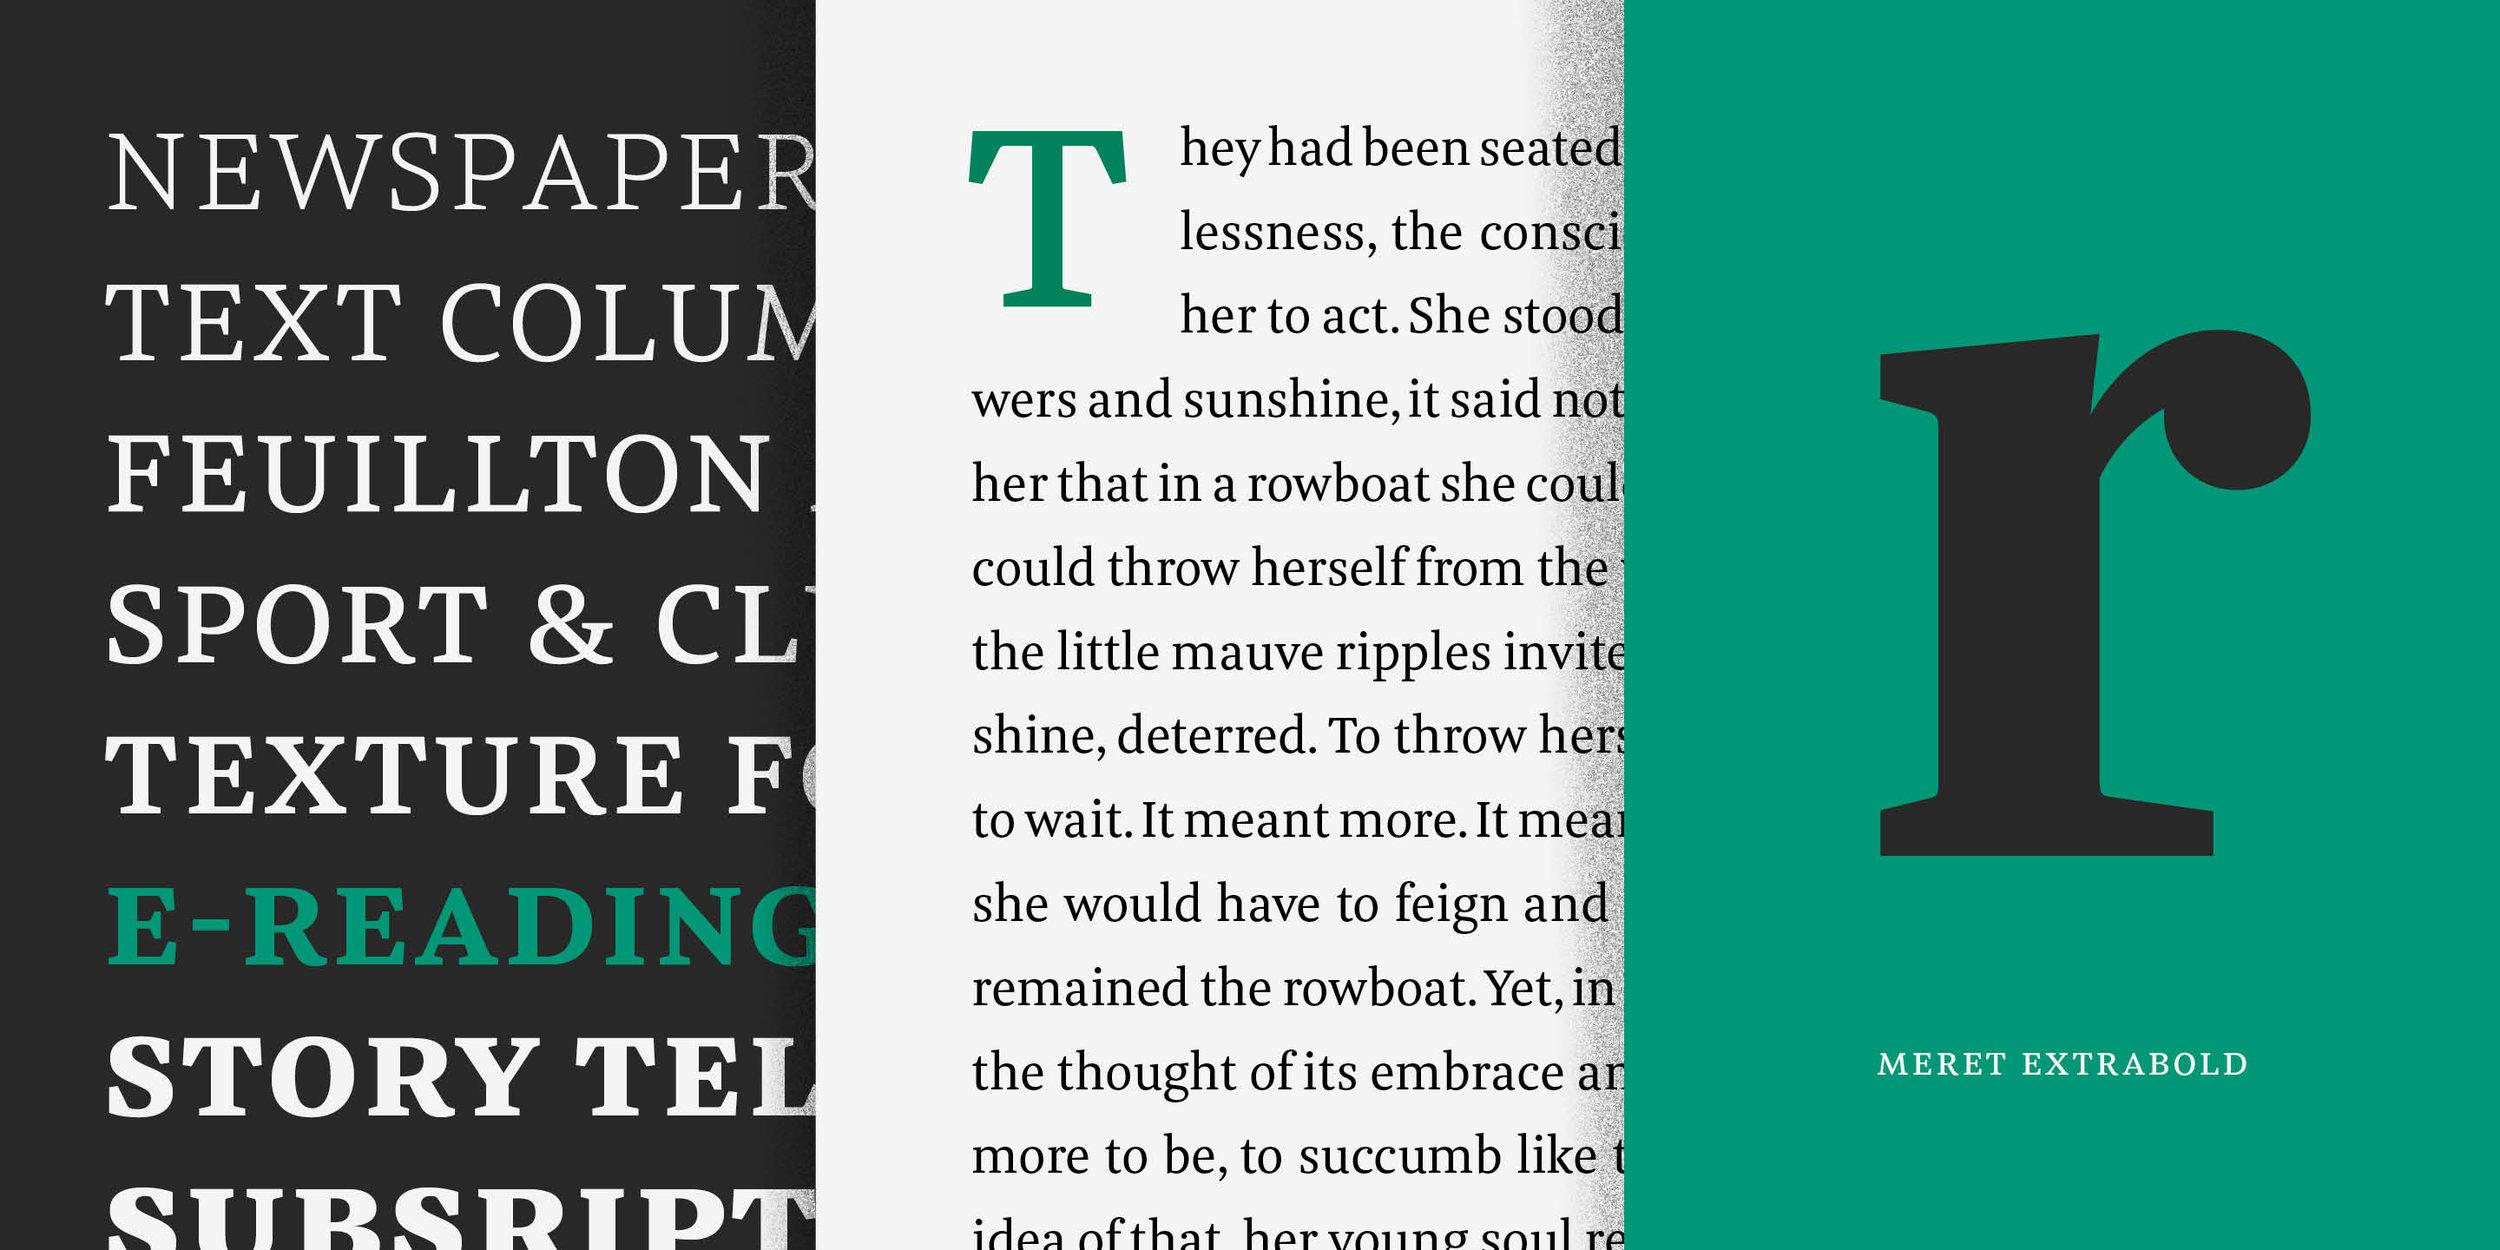 MeretPro-TypeMates-newspaper-editorial-typeface-font-2018-7.jpg